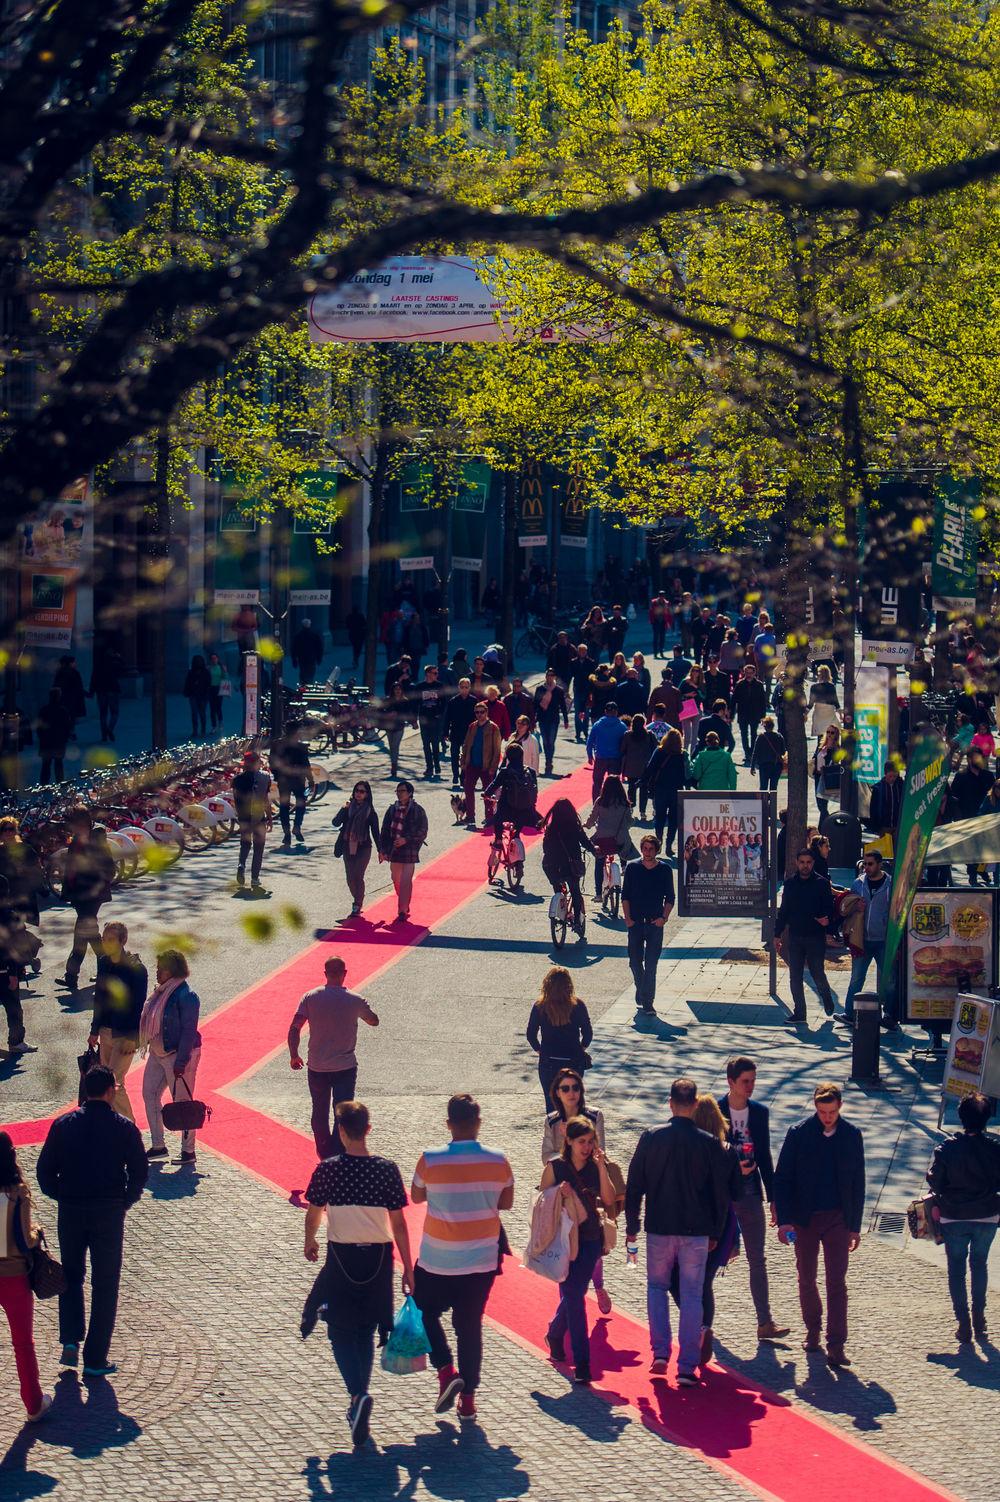 2016-05-01 - Meir Catwalk - Rode Loper @ Antwerpen - 034.jpg